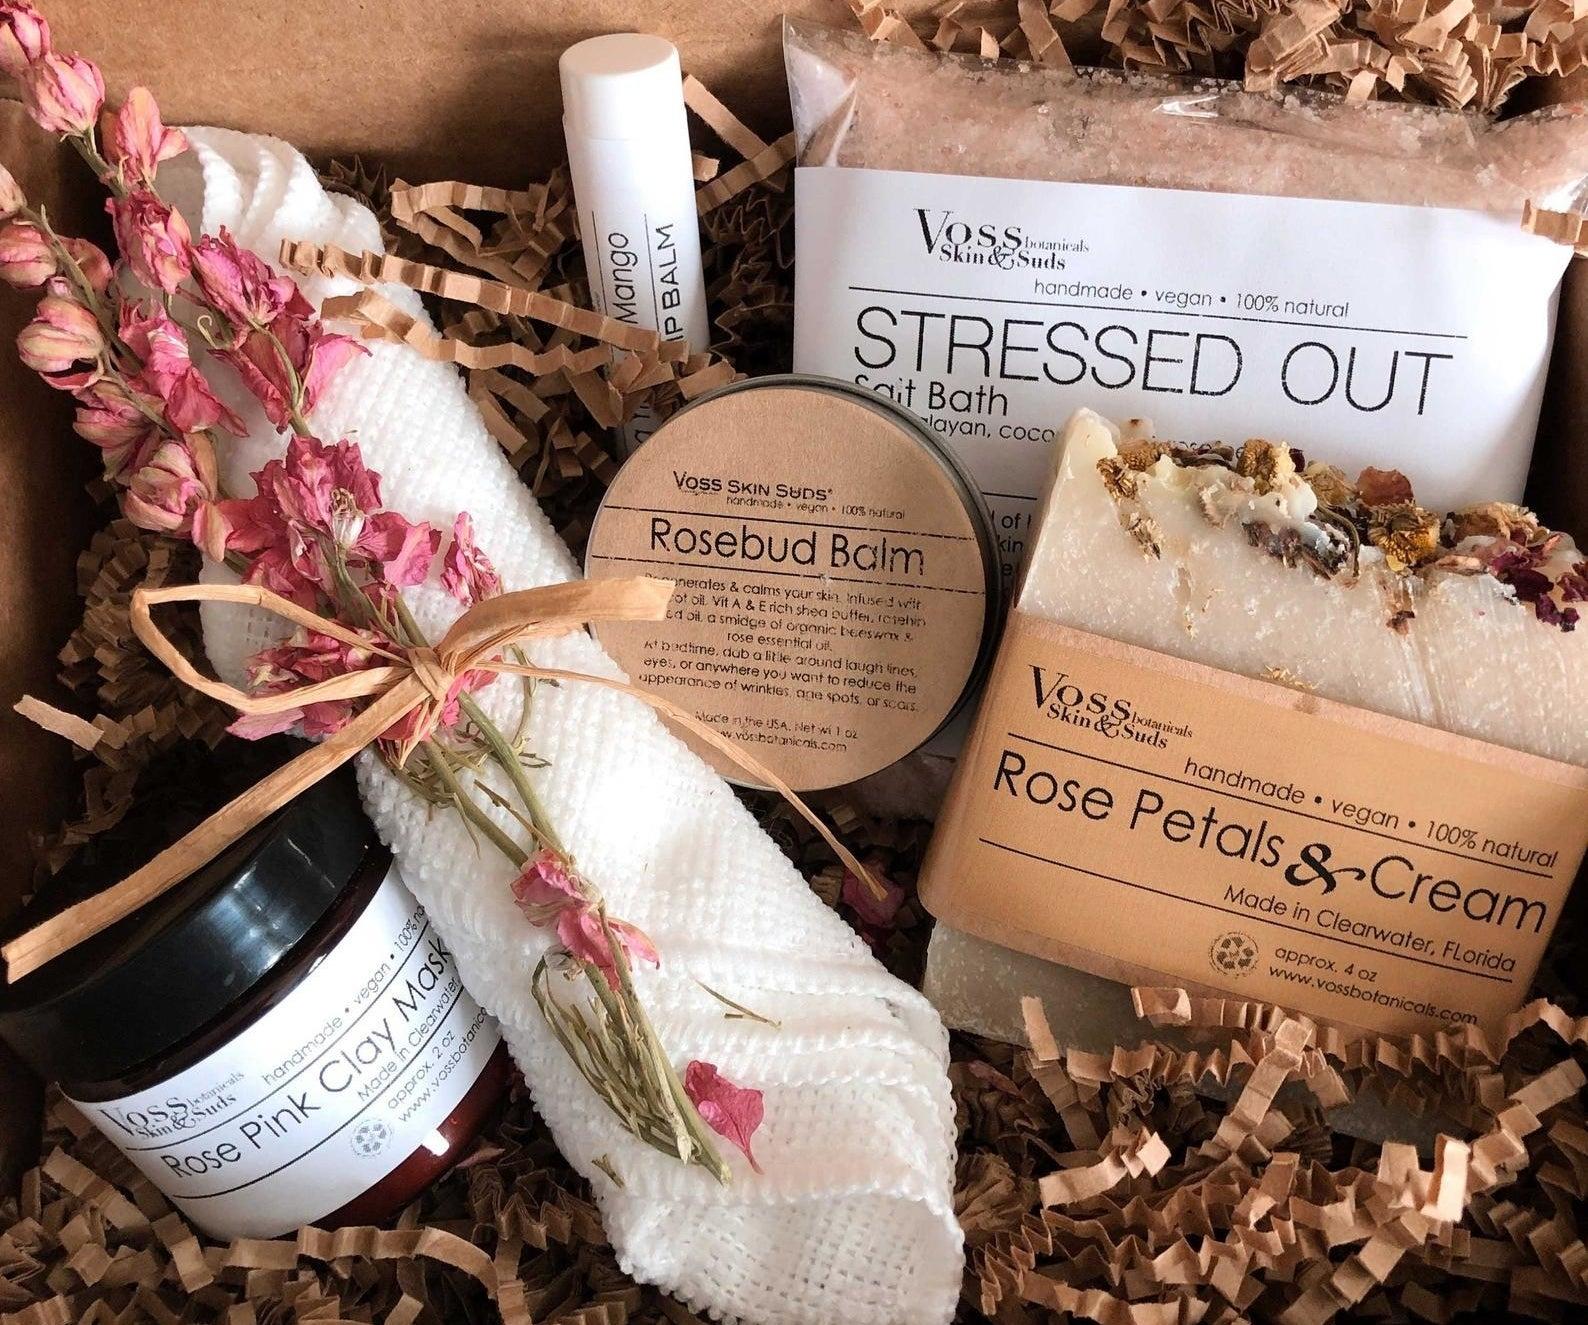 box of various spa-like products like salt bath, lip balm, and clay mask